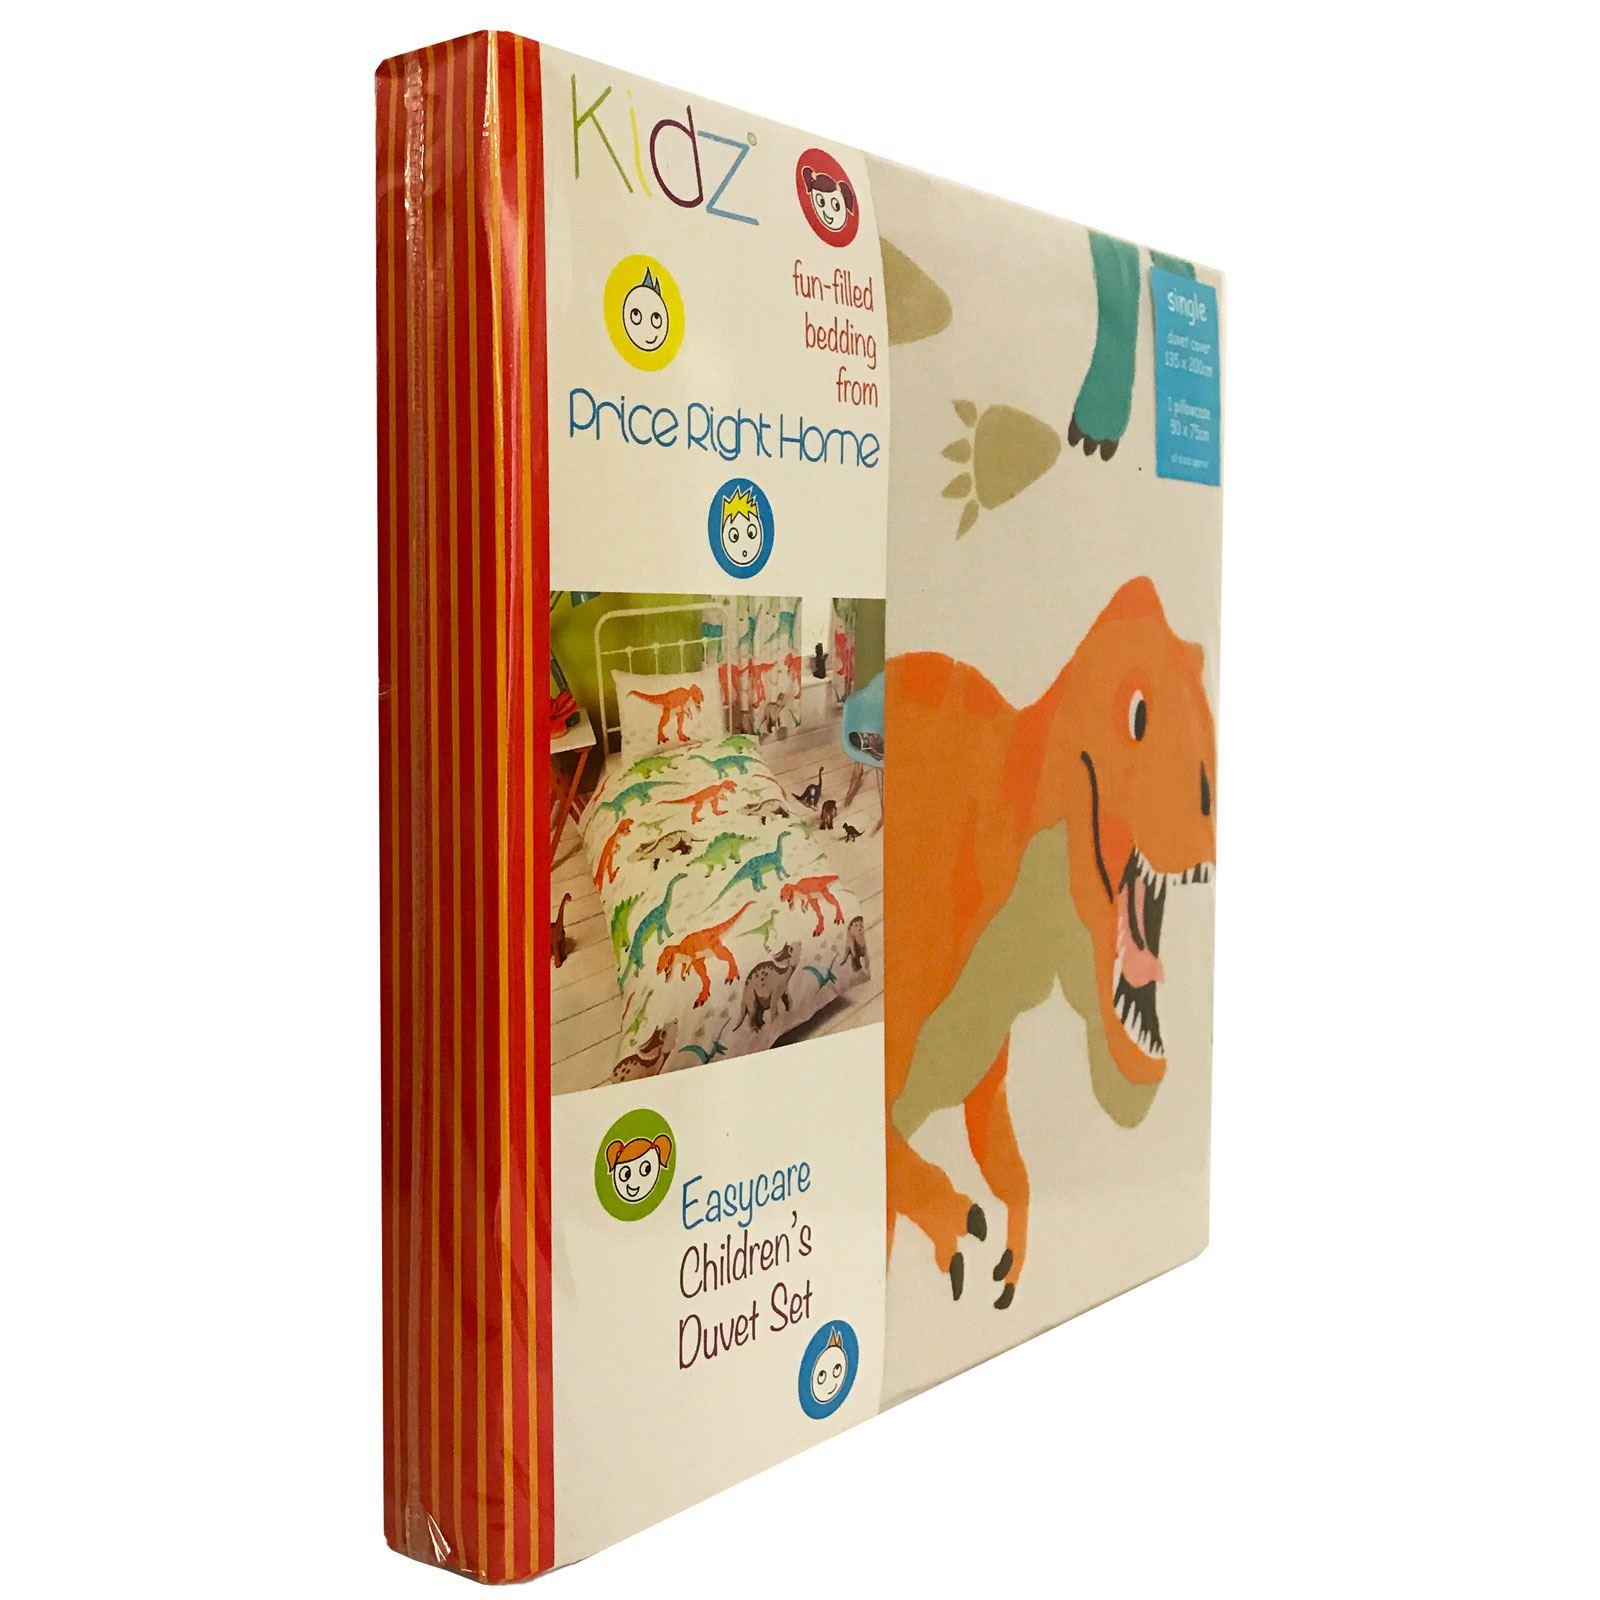 CHARACTER-AND-THEMED-SINGLE-DUVET-COVER-KIDS-BEDDING-SETS-AVENGERS-KITTY-UNICORN thumbnail 32